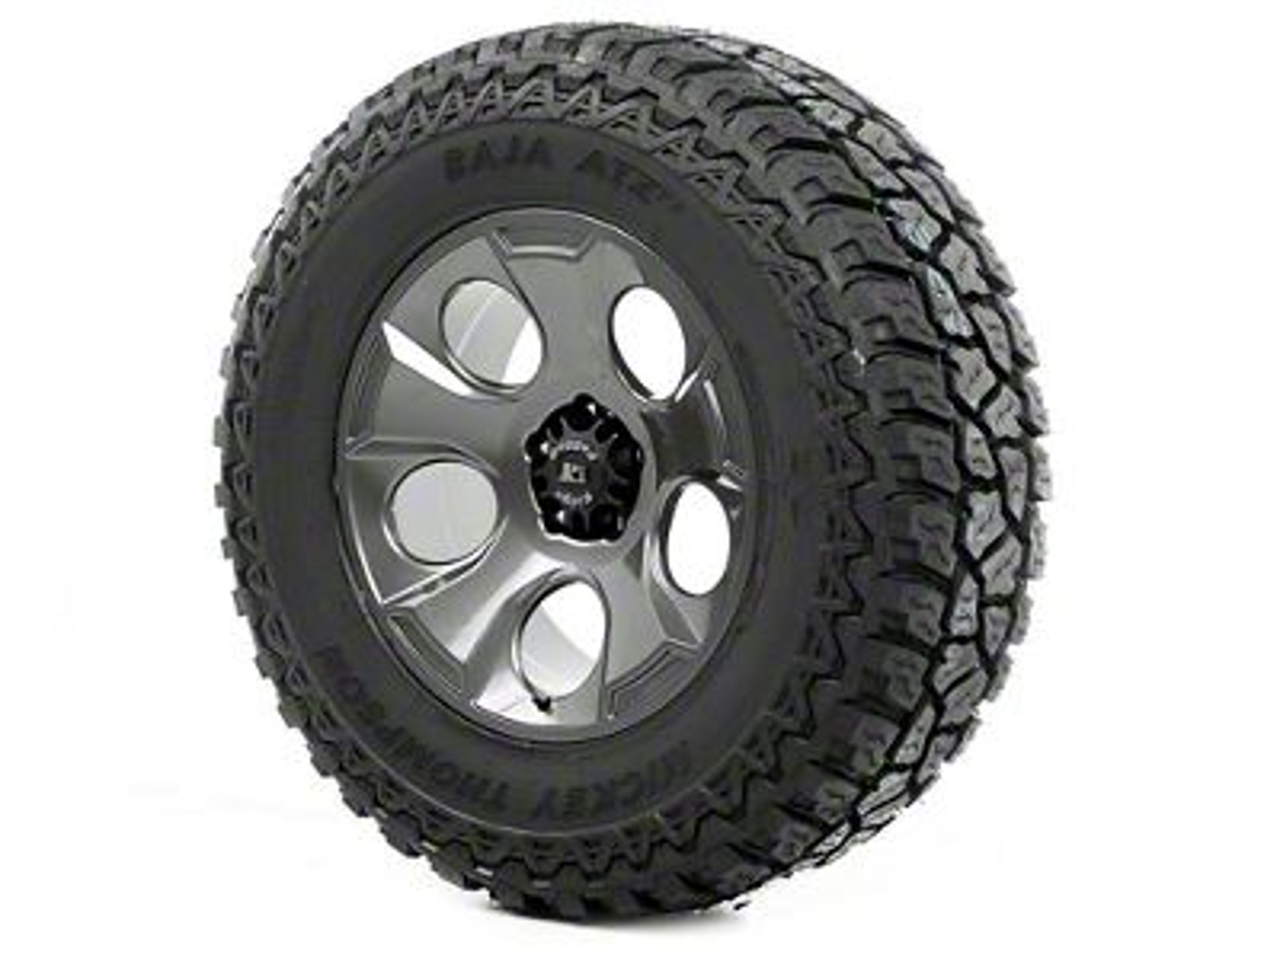 Rugged Ridge Drakon Wheel 20x9 Gun Metal and Mickey Thompson ATZ P3 37x12.50x20 Tire (07-18 Jeep Wrangler JK)